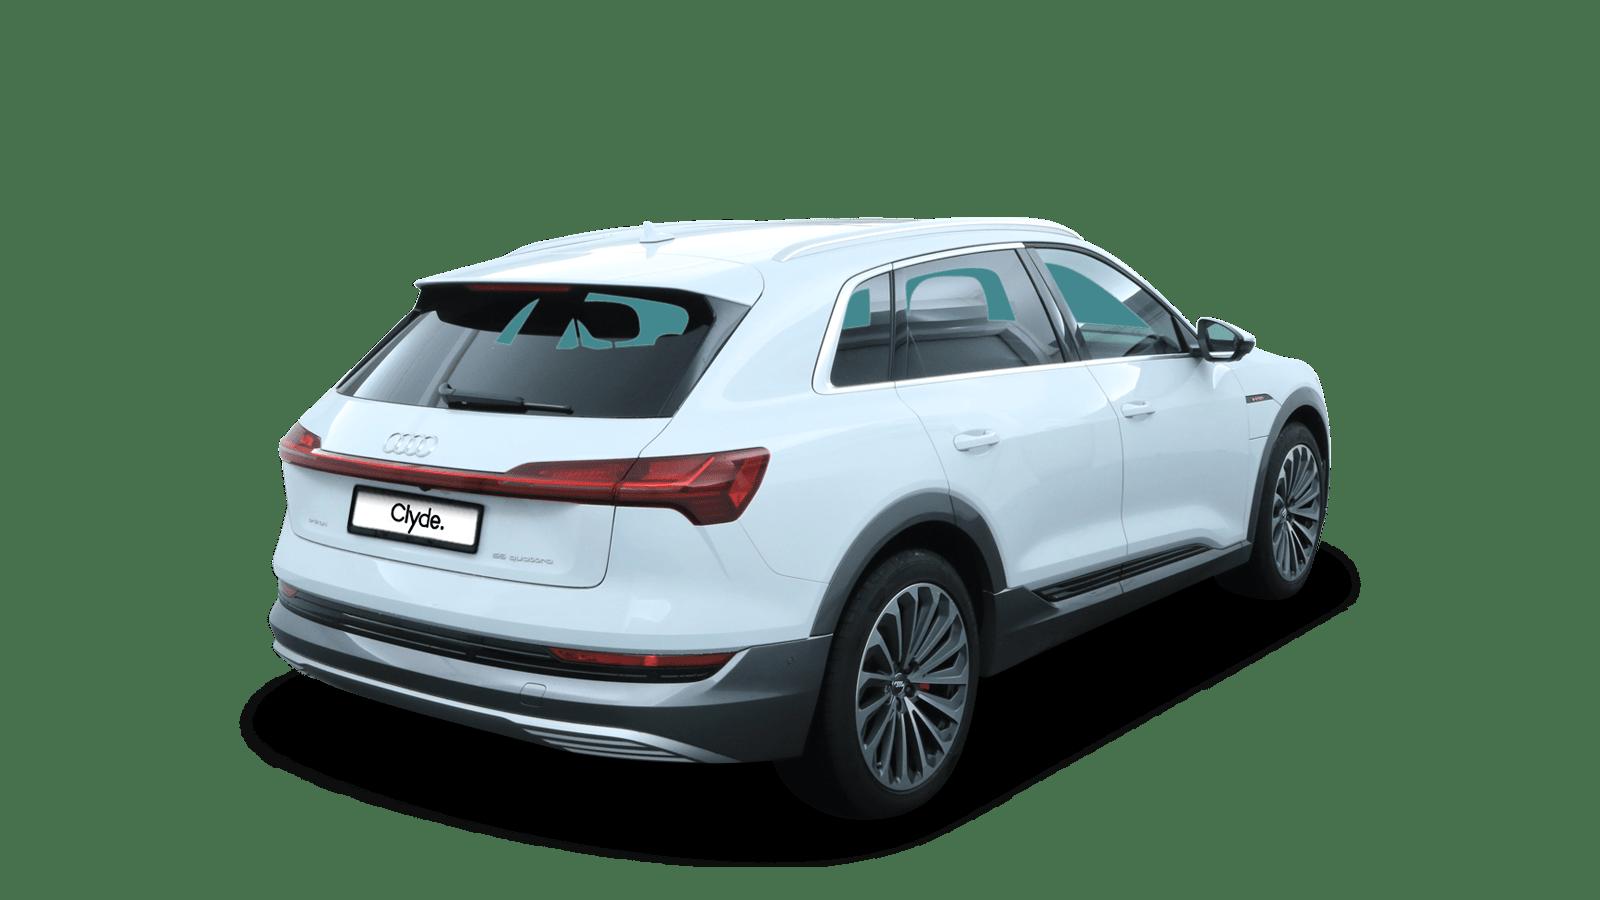 Audi e-tron 55 quattro White back - Clyde car subscription